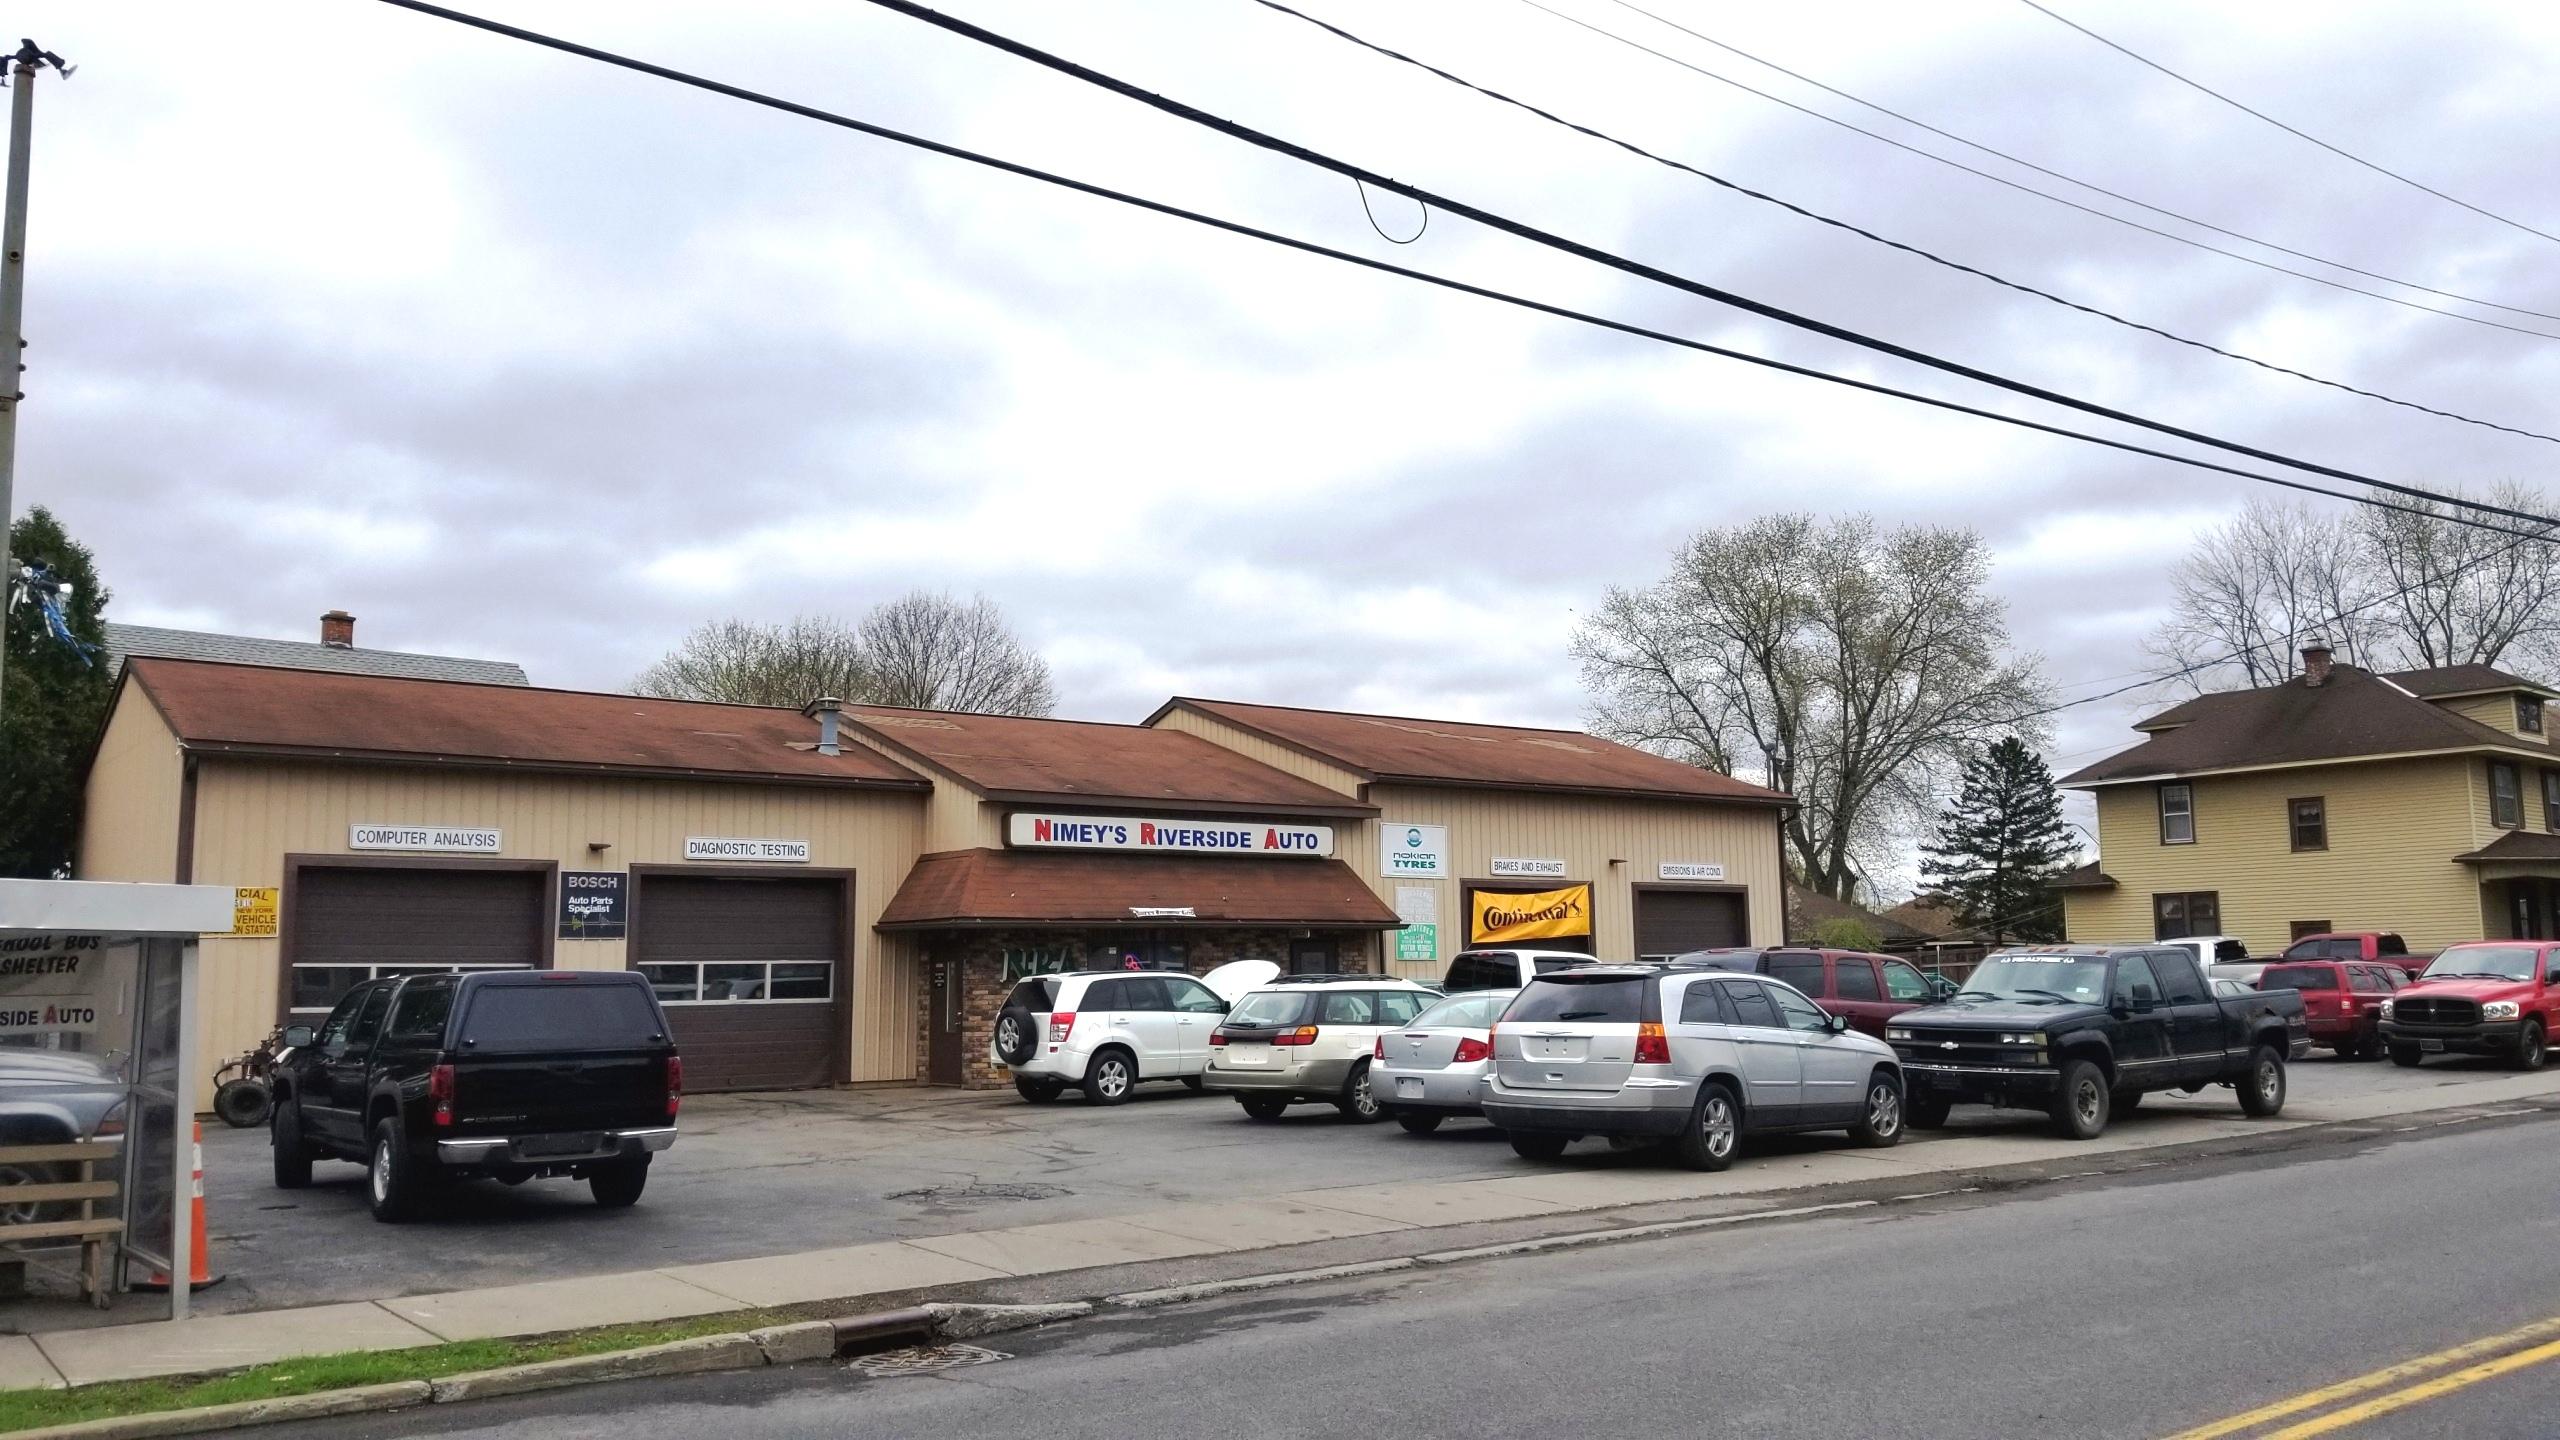 32-38 Whitesboro Street, Yorkville, New York